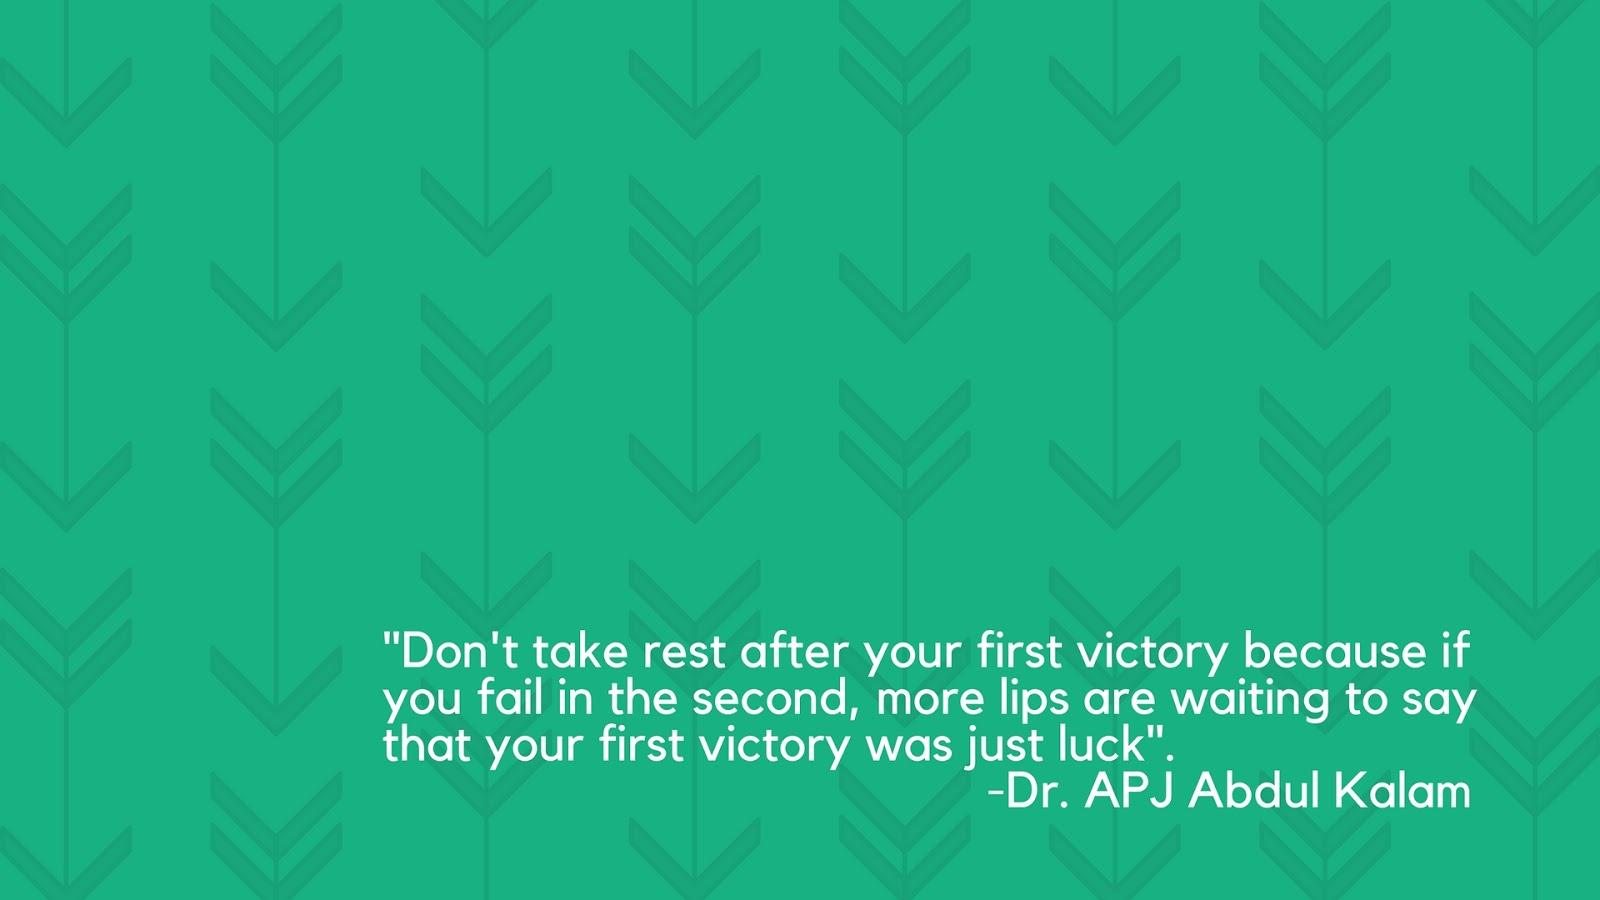 Happy New Year 2017 - Dr APJ Abdul Kalam Quotes Wallpaper